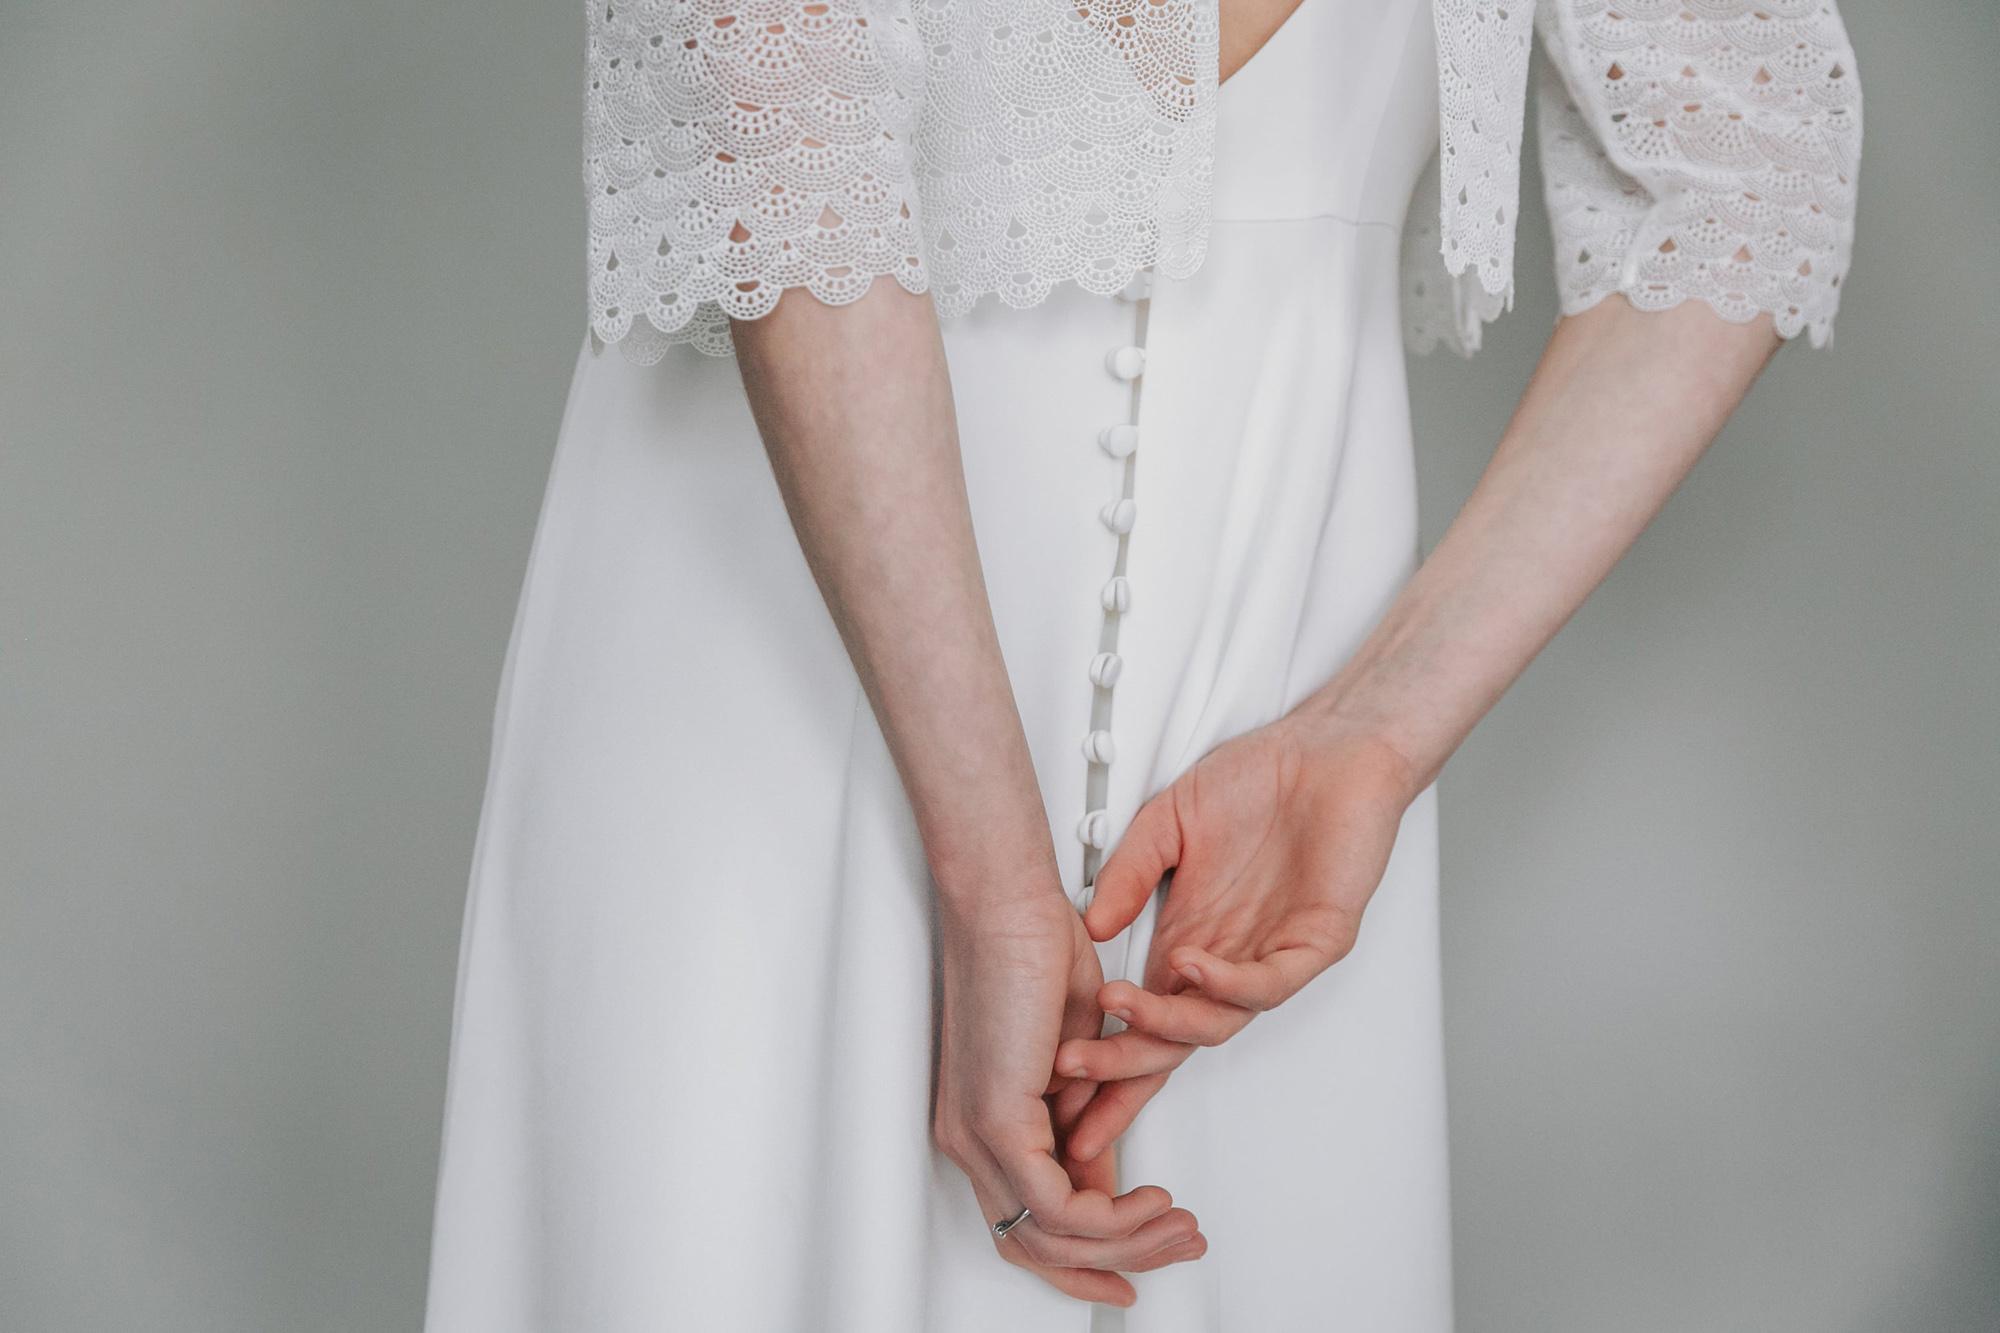 Kate-Beaumont-Sheffield-Freesia-Guipure-Lace-Jacket-Snowdrop-Minimal-Modern-Elegant-Matt-Silk-Wedding-Gown-12.jpg